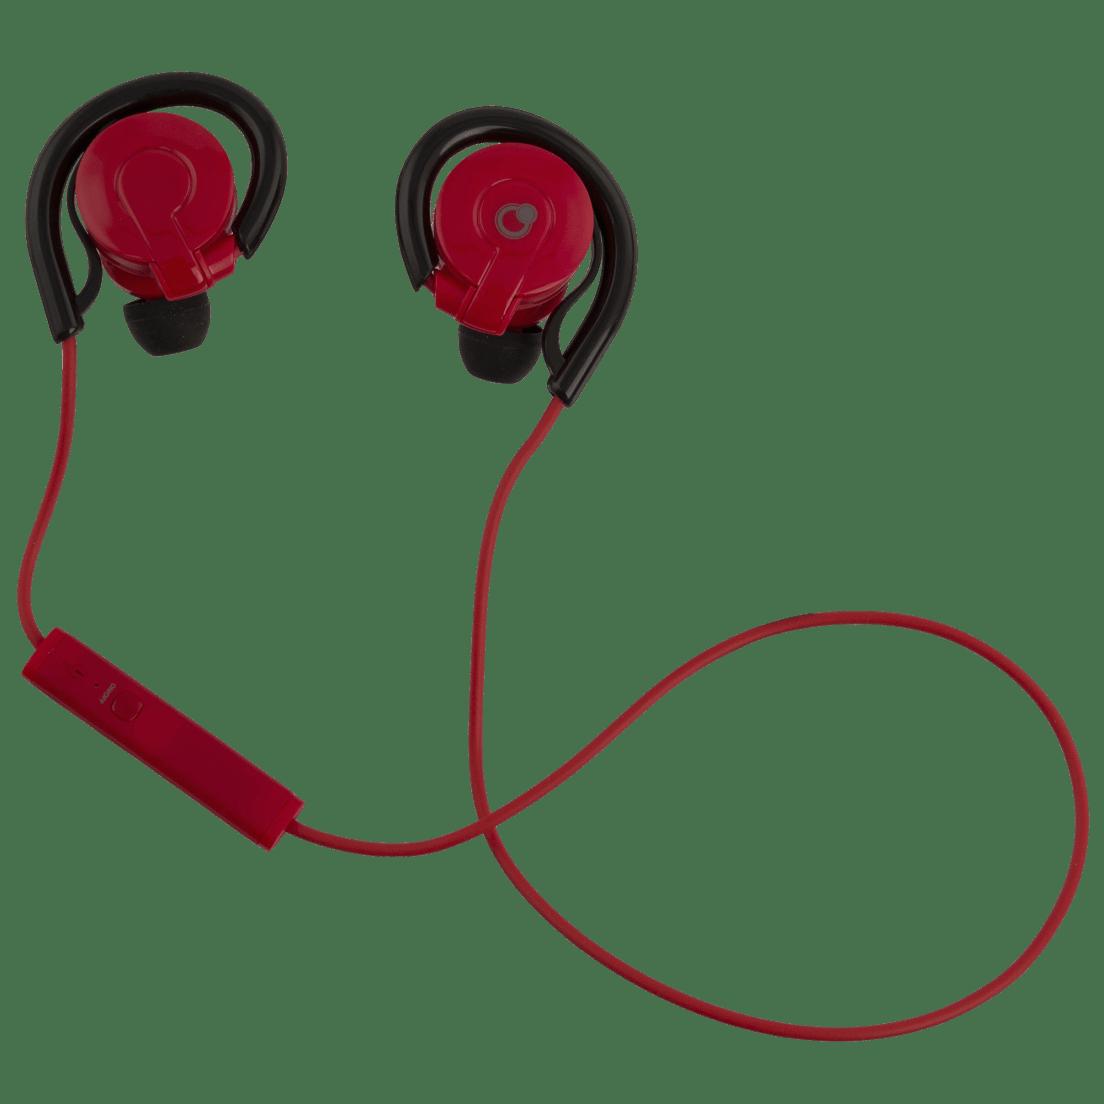 df36739b03a 2-Pack: Bluetooth Wireless In-Ear Headphones